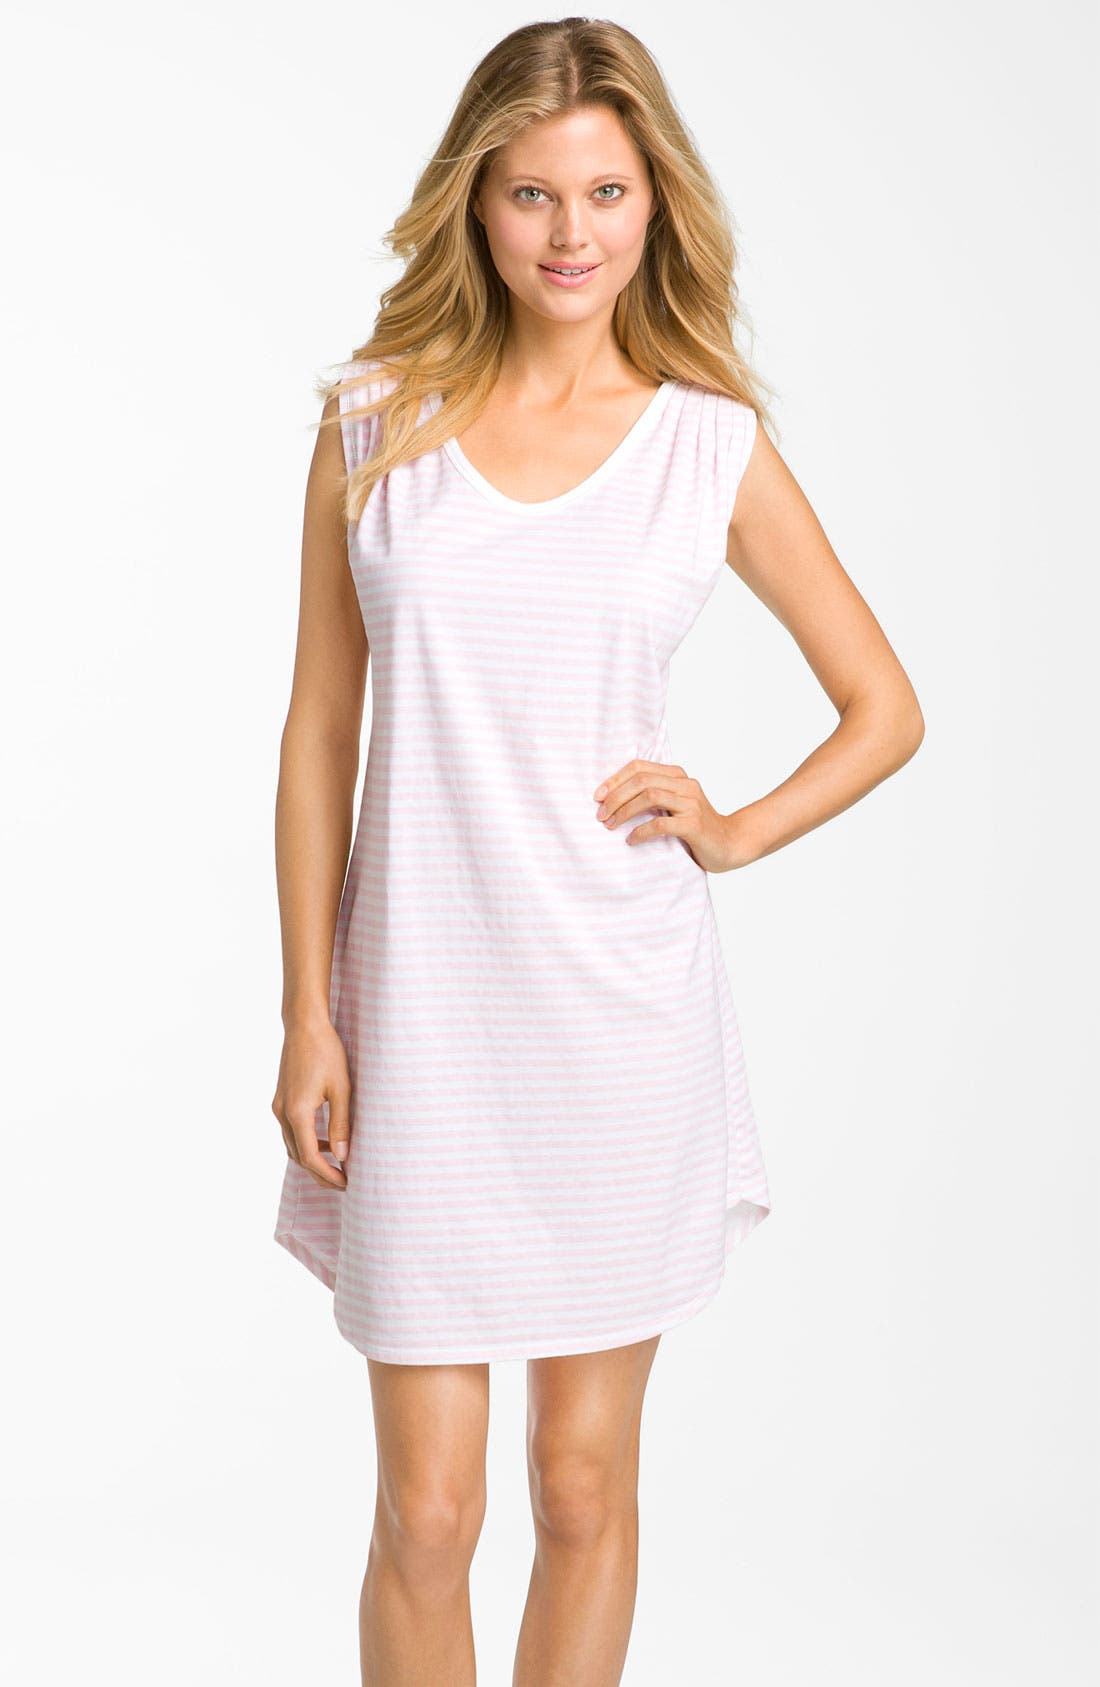 Main Image - Carole Hochman Designs 'Coastal Stripe' Sleep Shirt